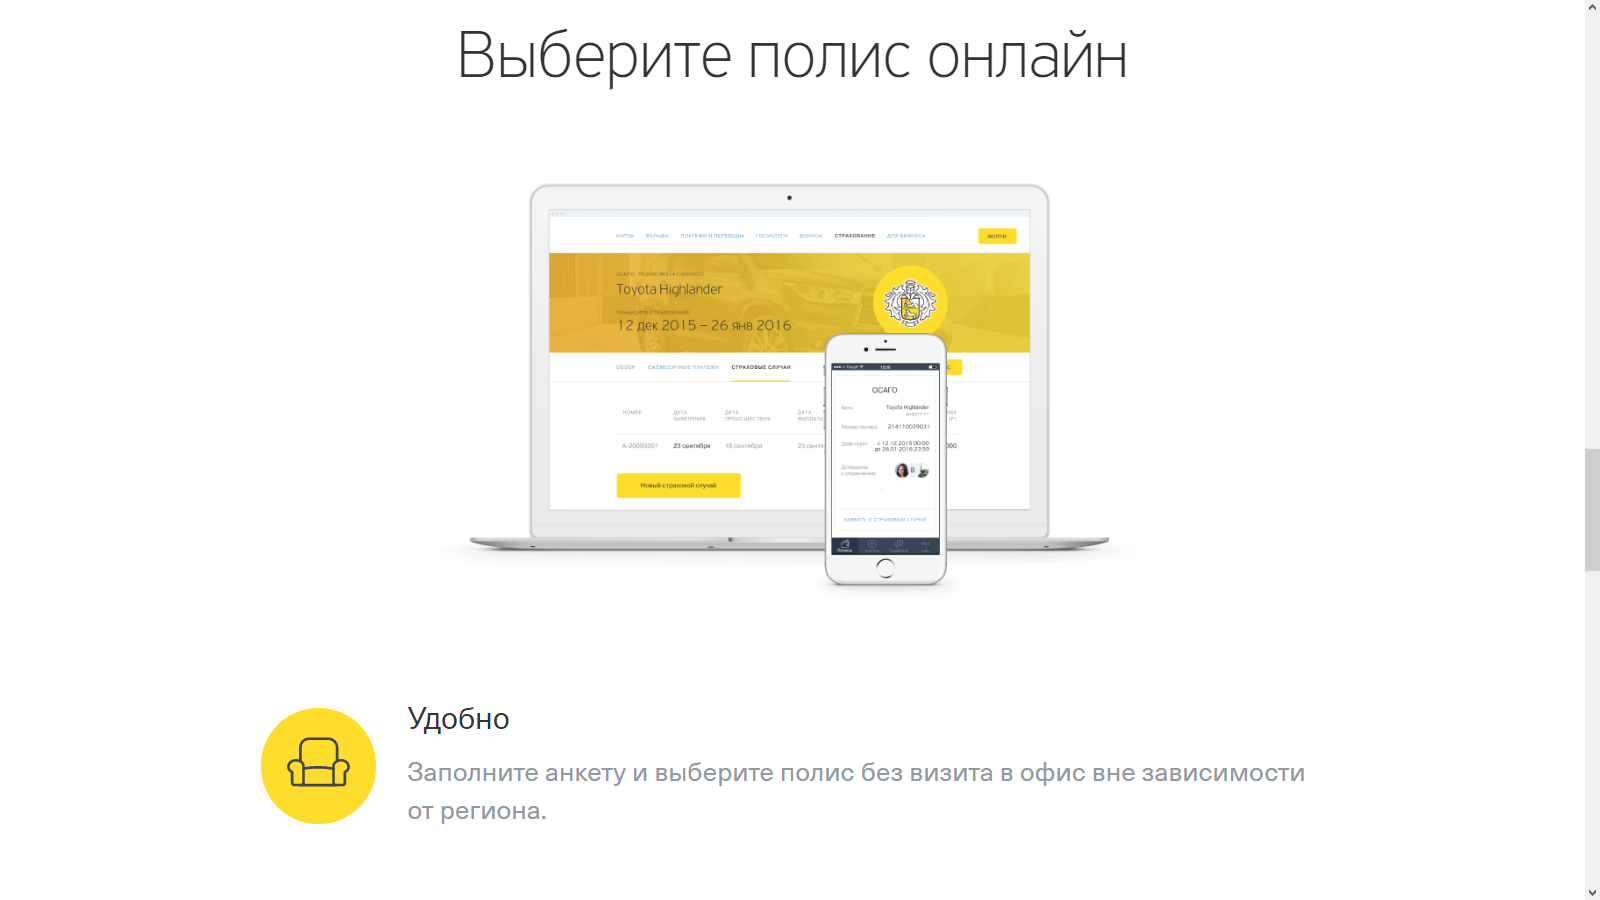 Тинькофф страхование ОСАГО онлайн